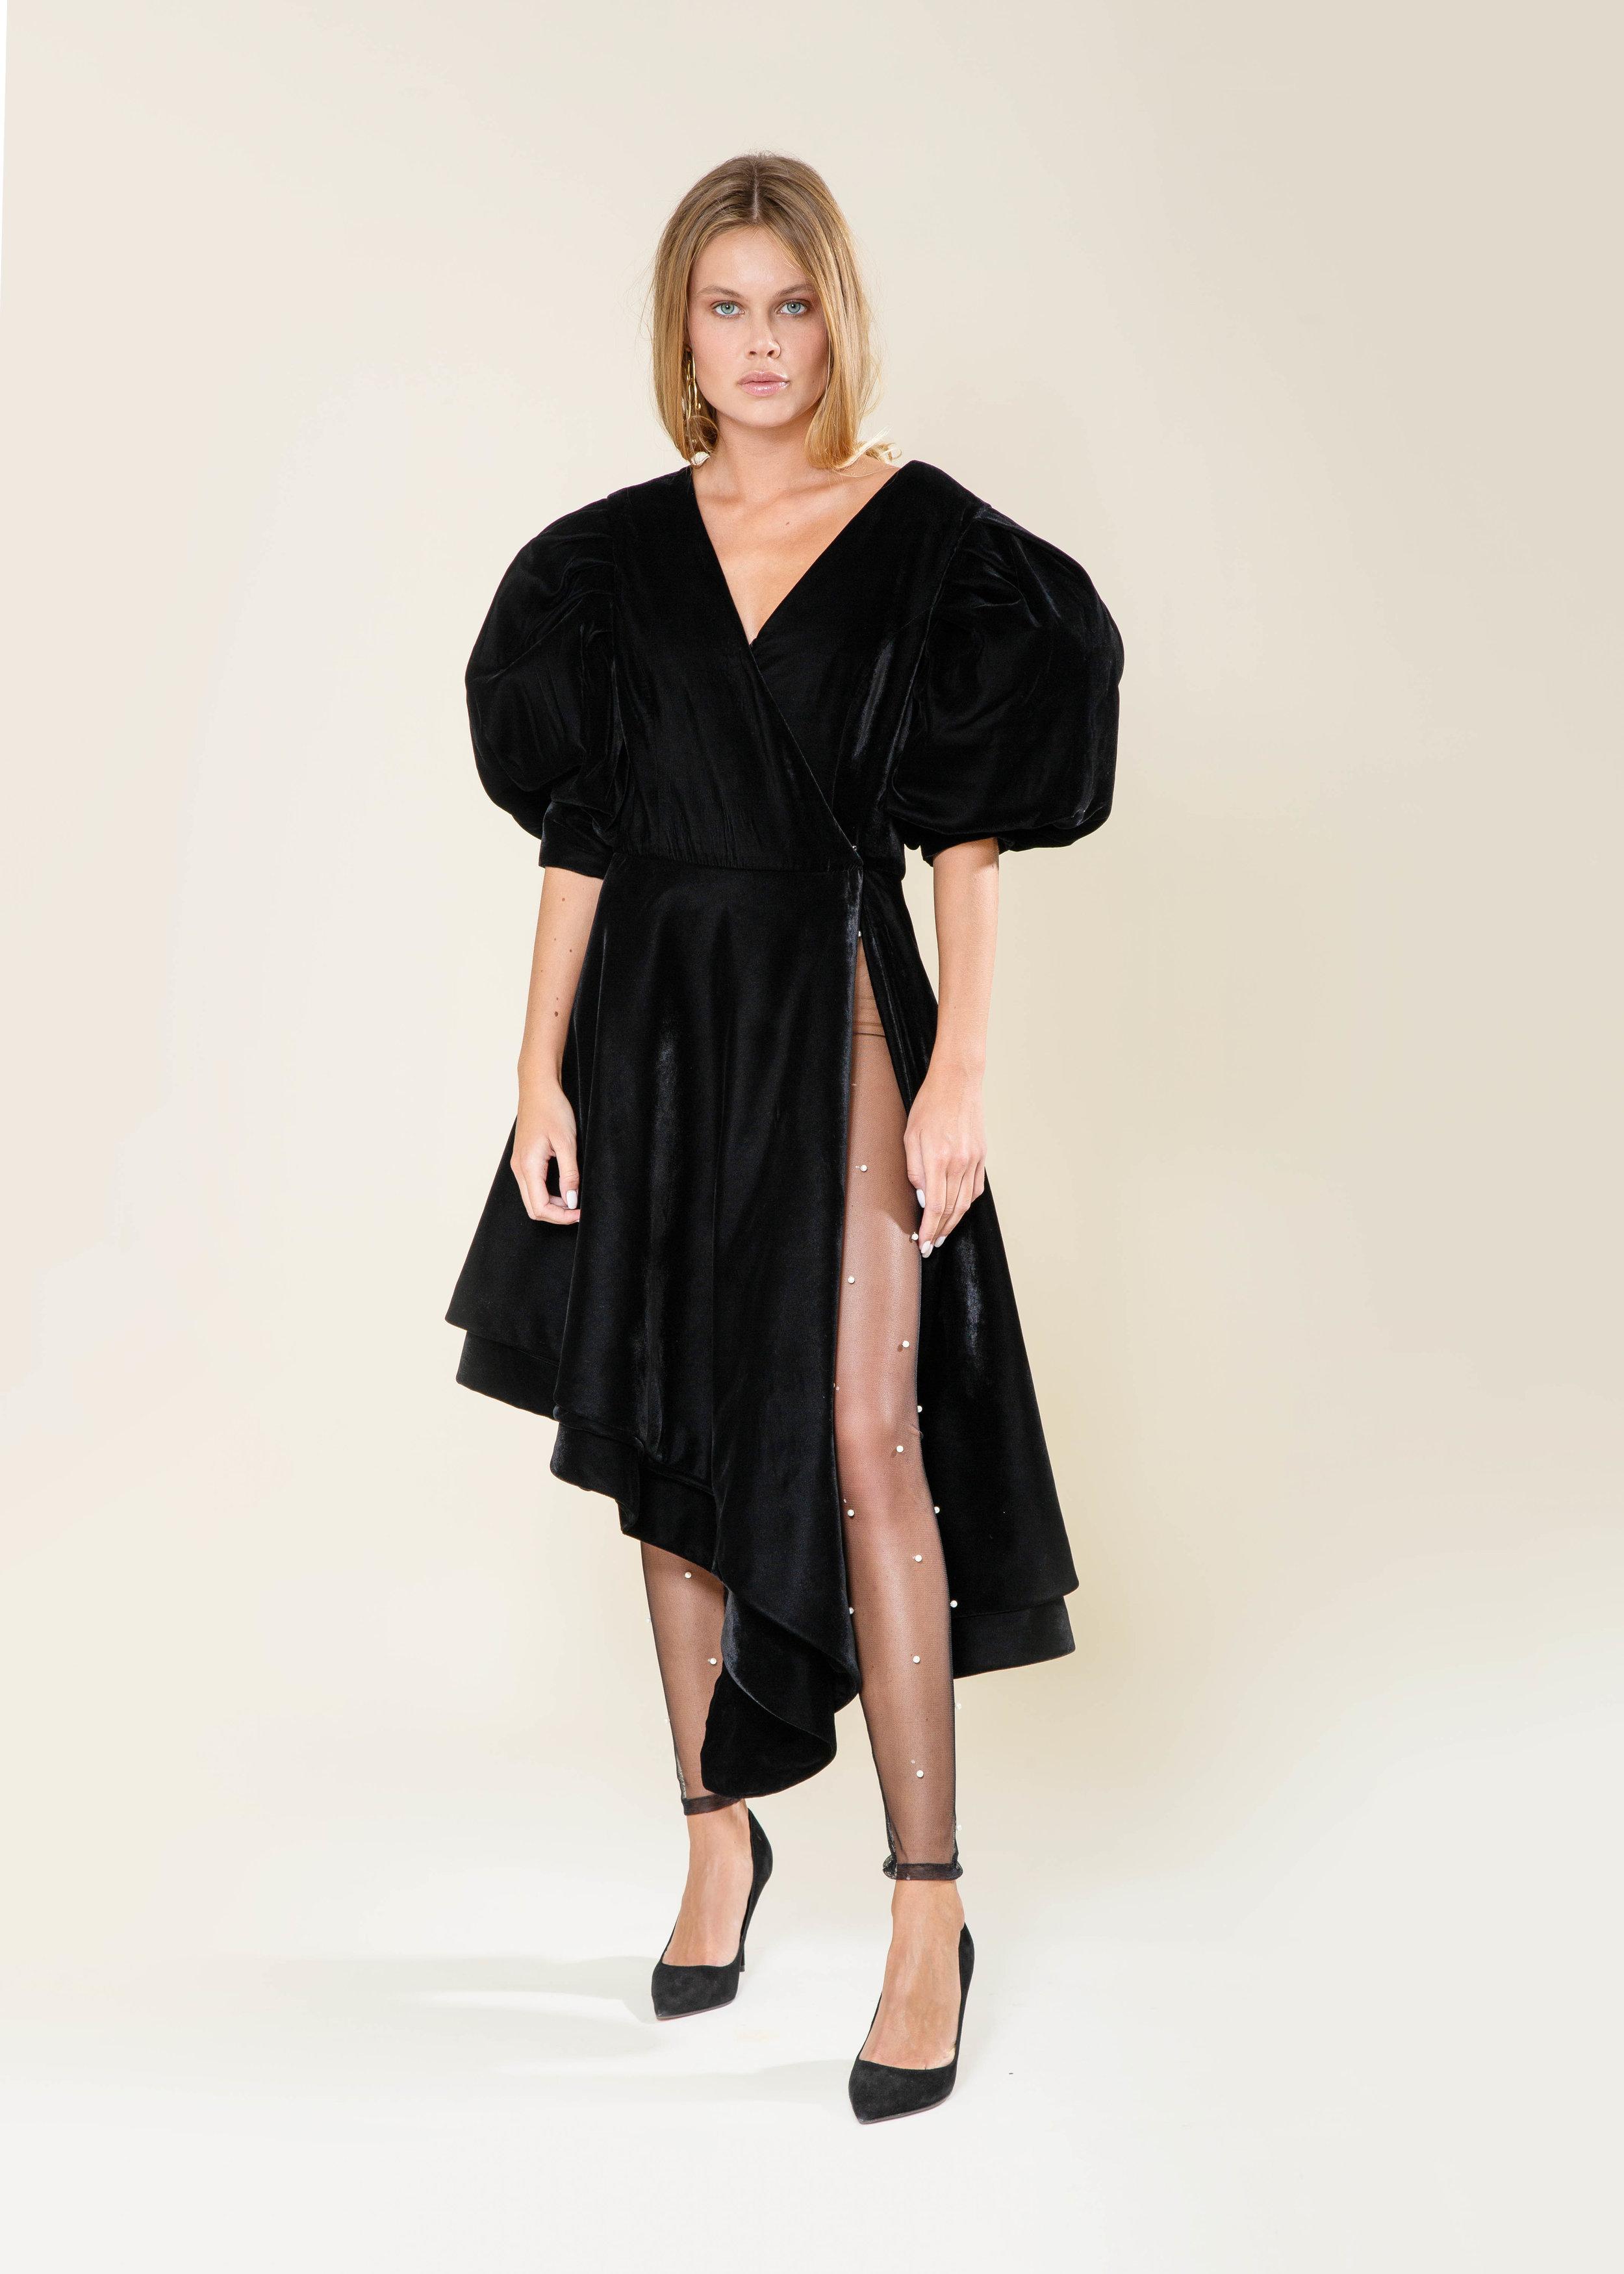 COMPLETE THE LOOK - Jacqueline Dress CoatUSD 540